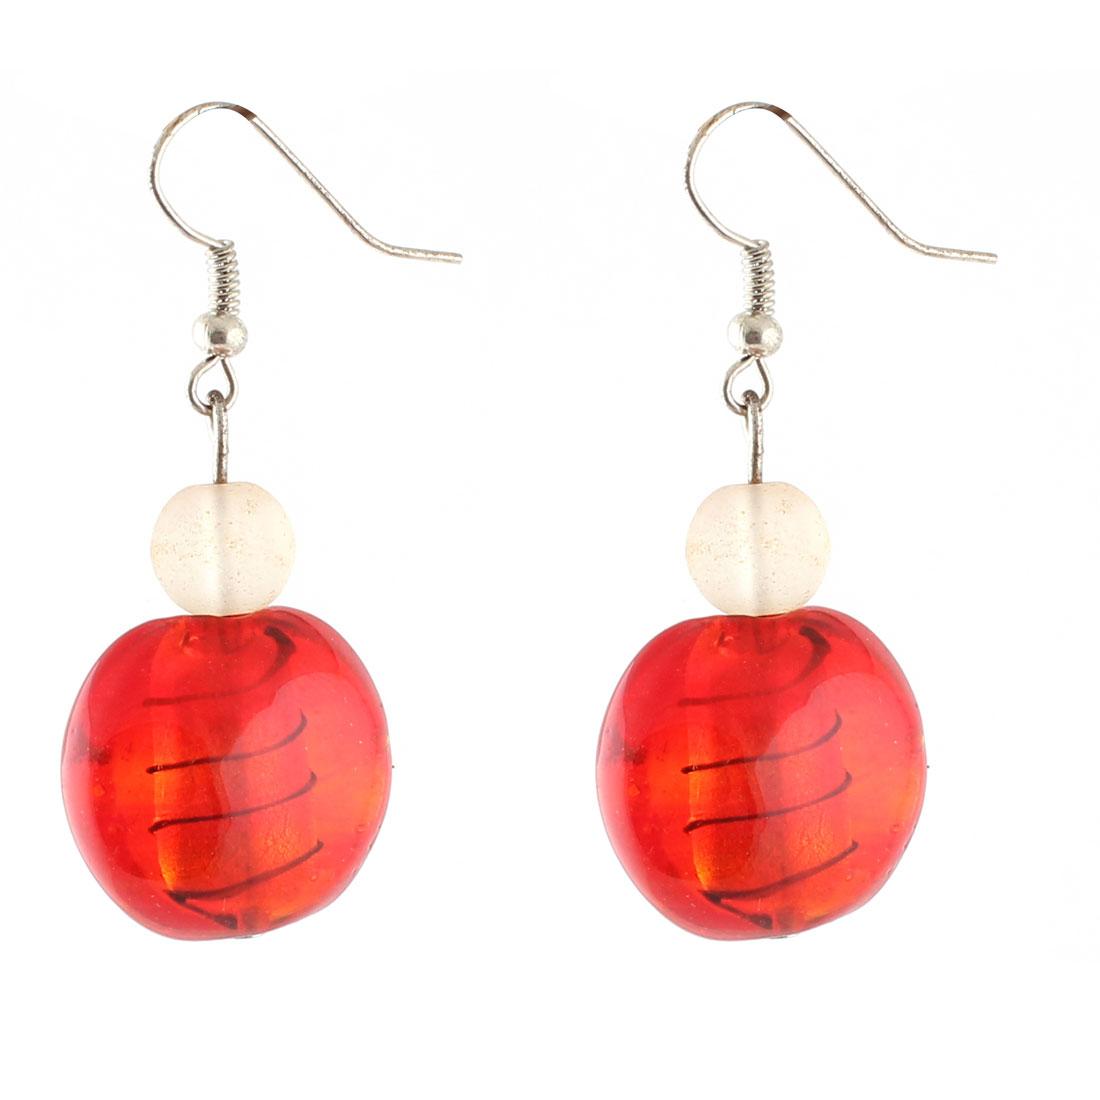 Woman Plastic Lines Pattern Round Bead Dangling Pendant Earrings Red Pair